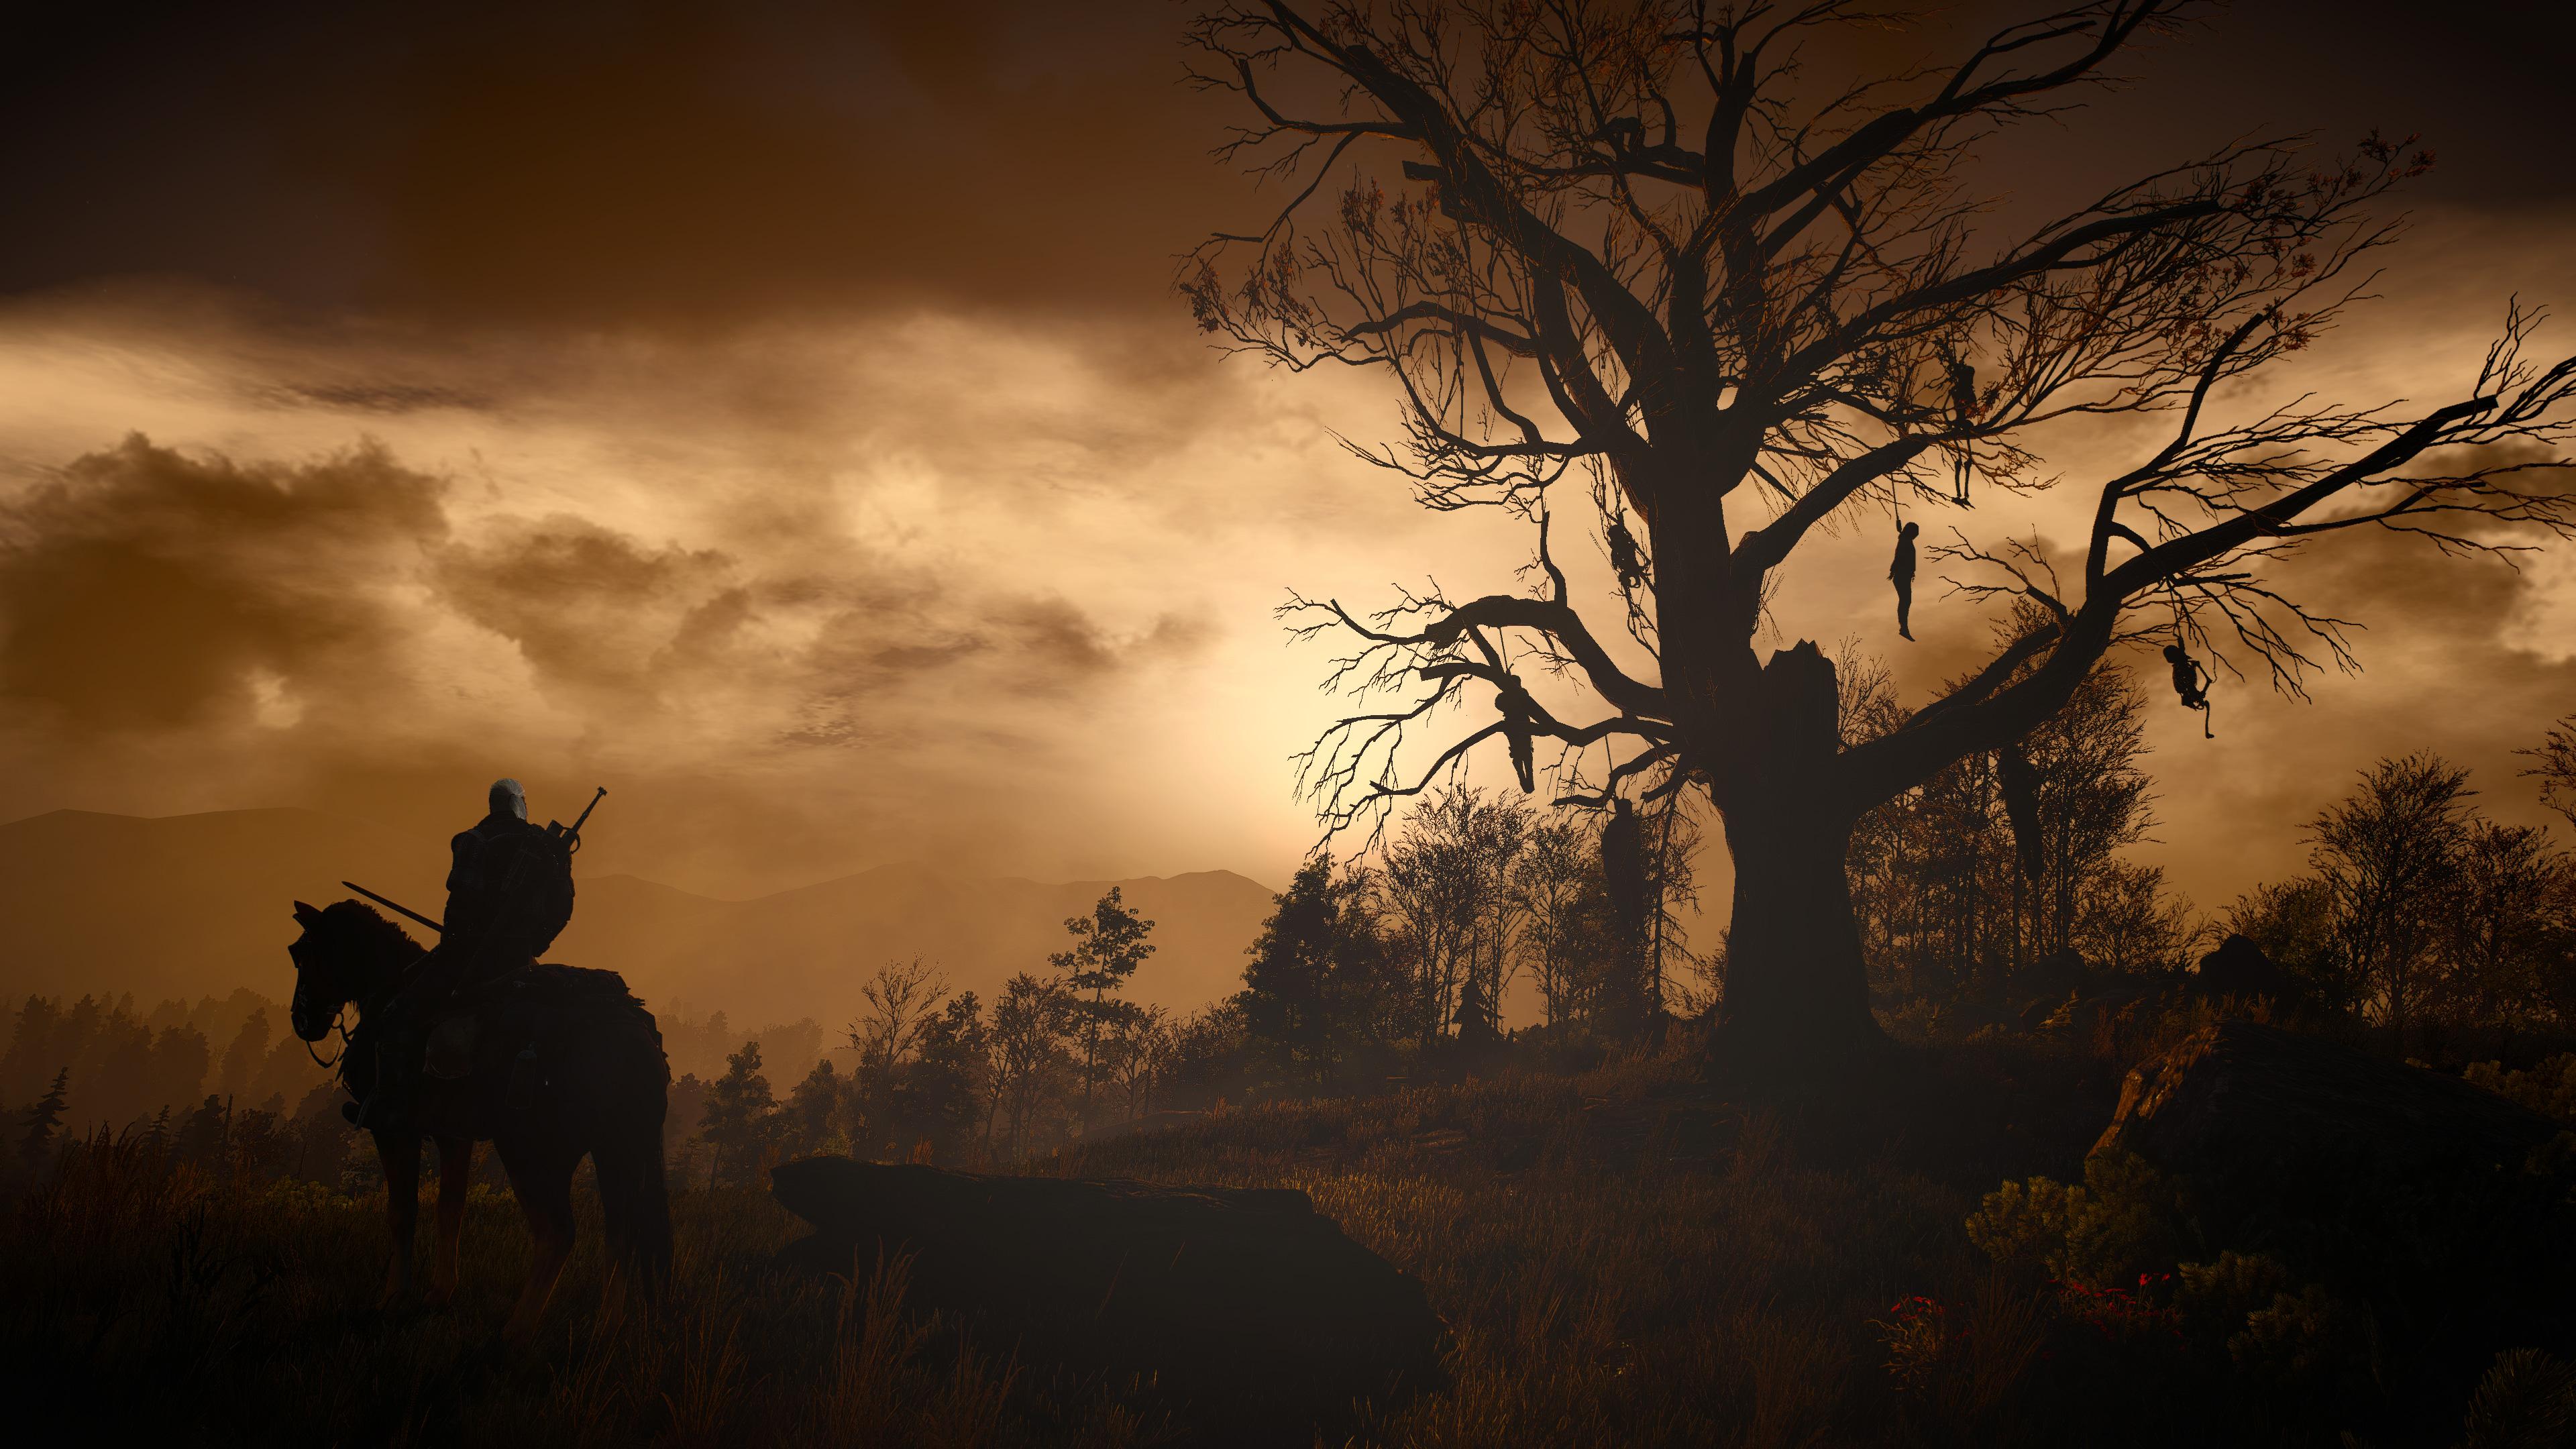 The Witcher Video Game Art video games artwork tree bark horse Geralt of Rivia